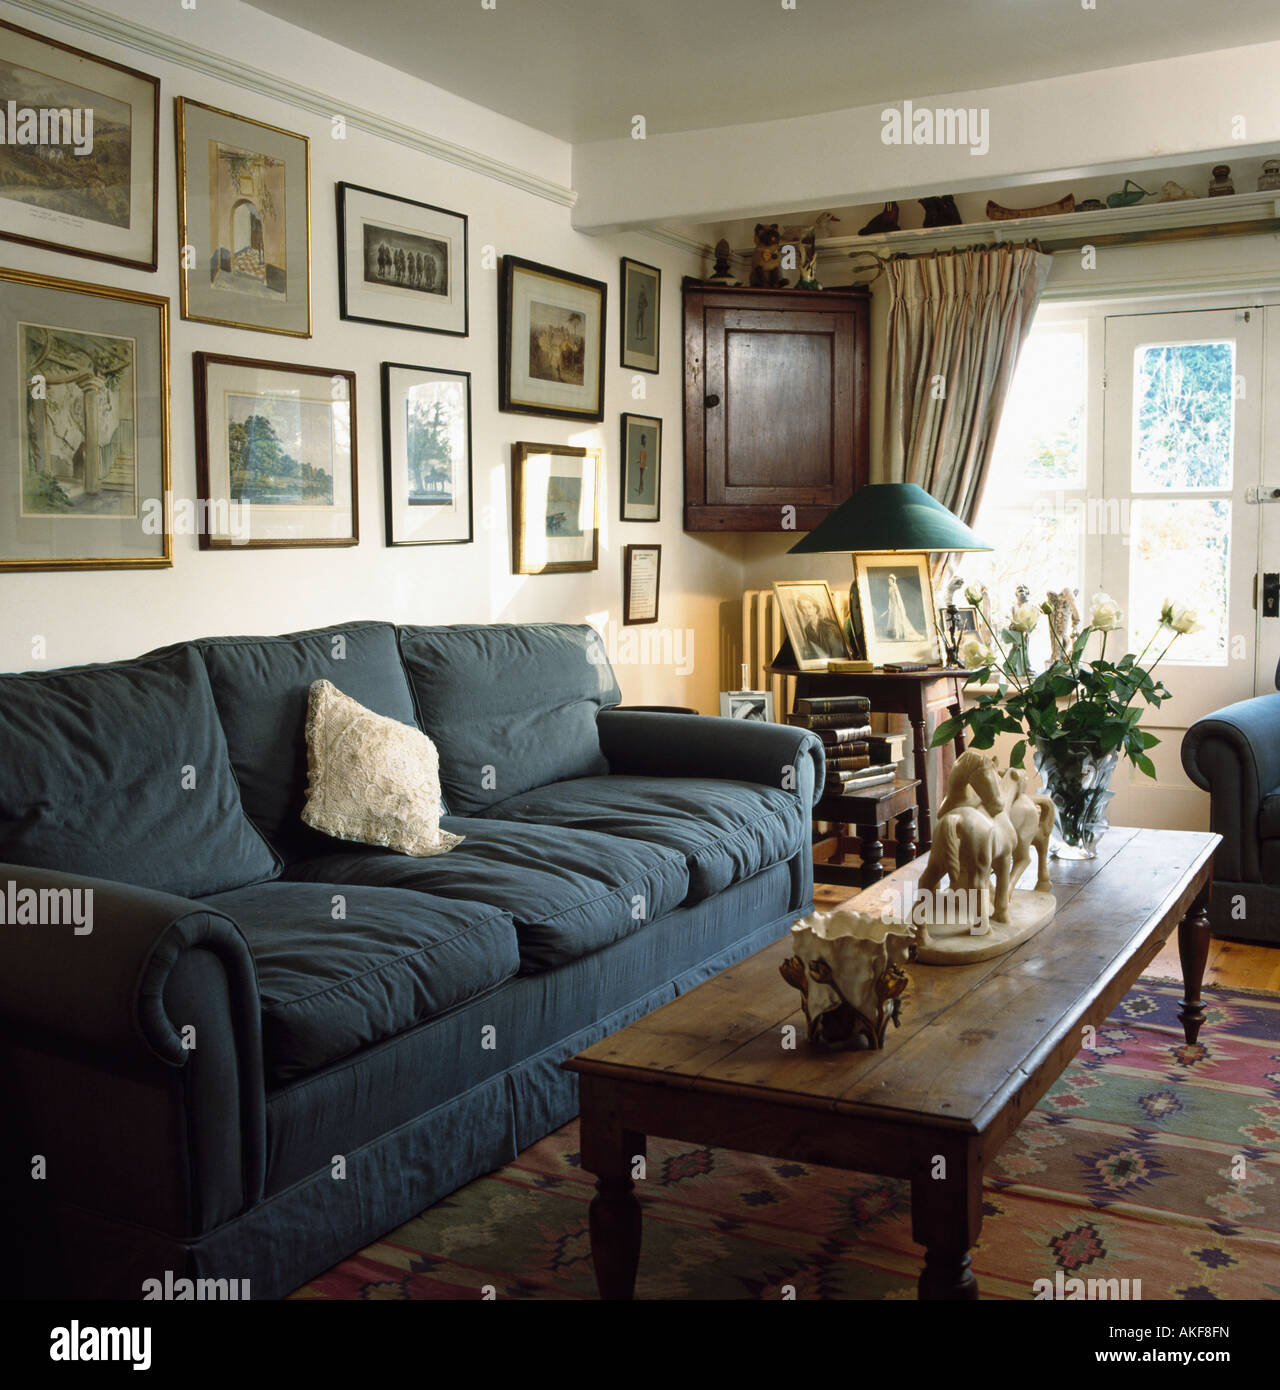 Ethan Allen Townhouse Coffee Table: Interiors Sittingroom Table Sofa Stock Photos & Interiors